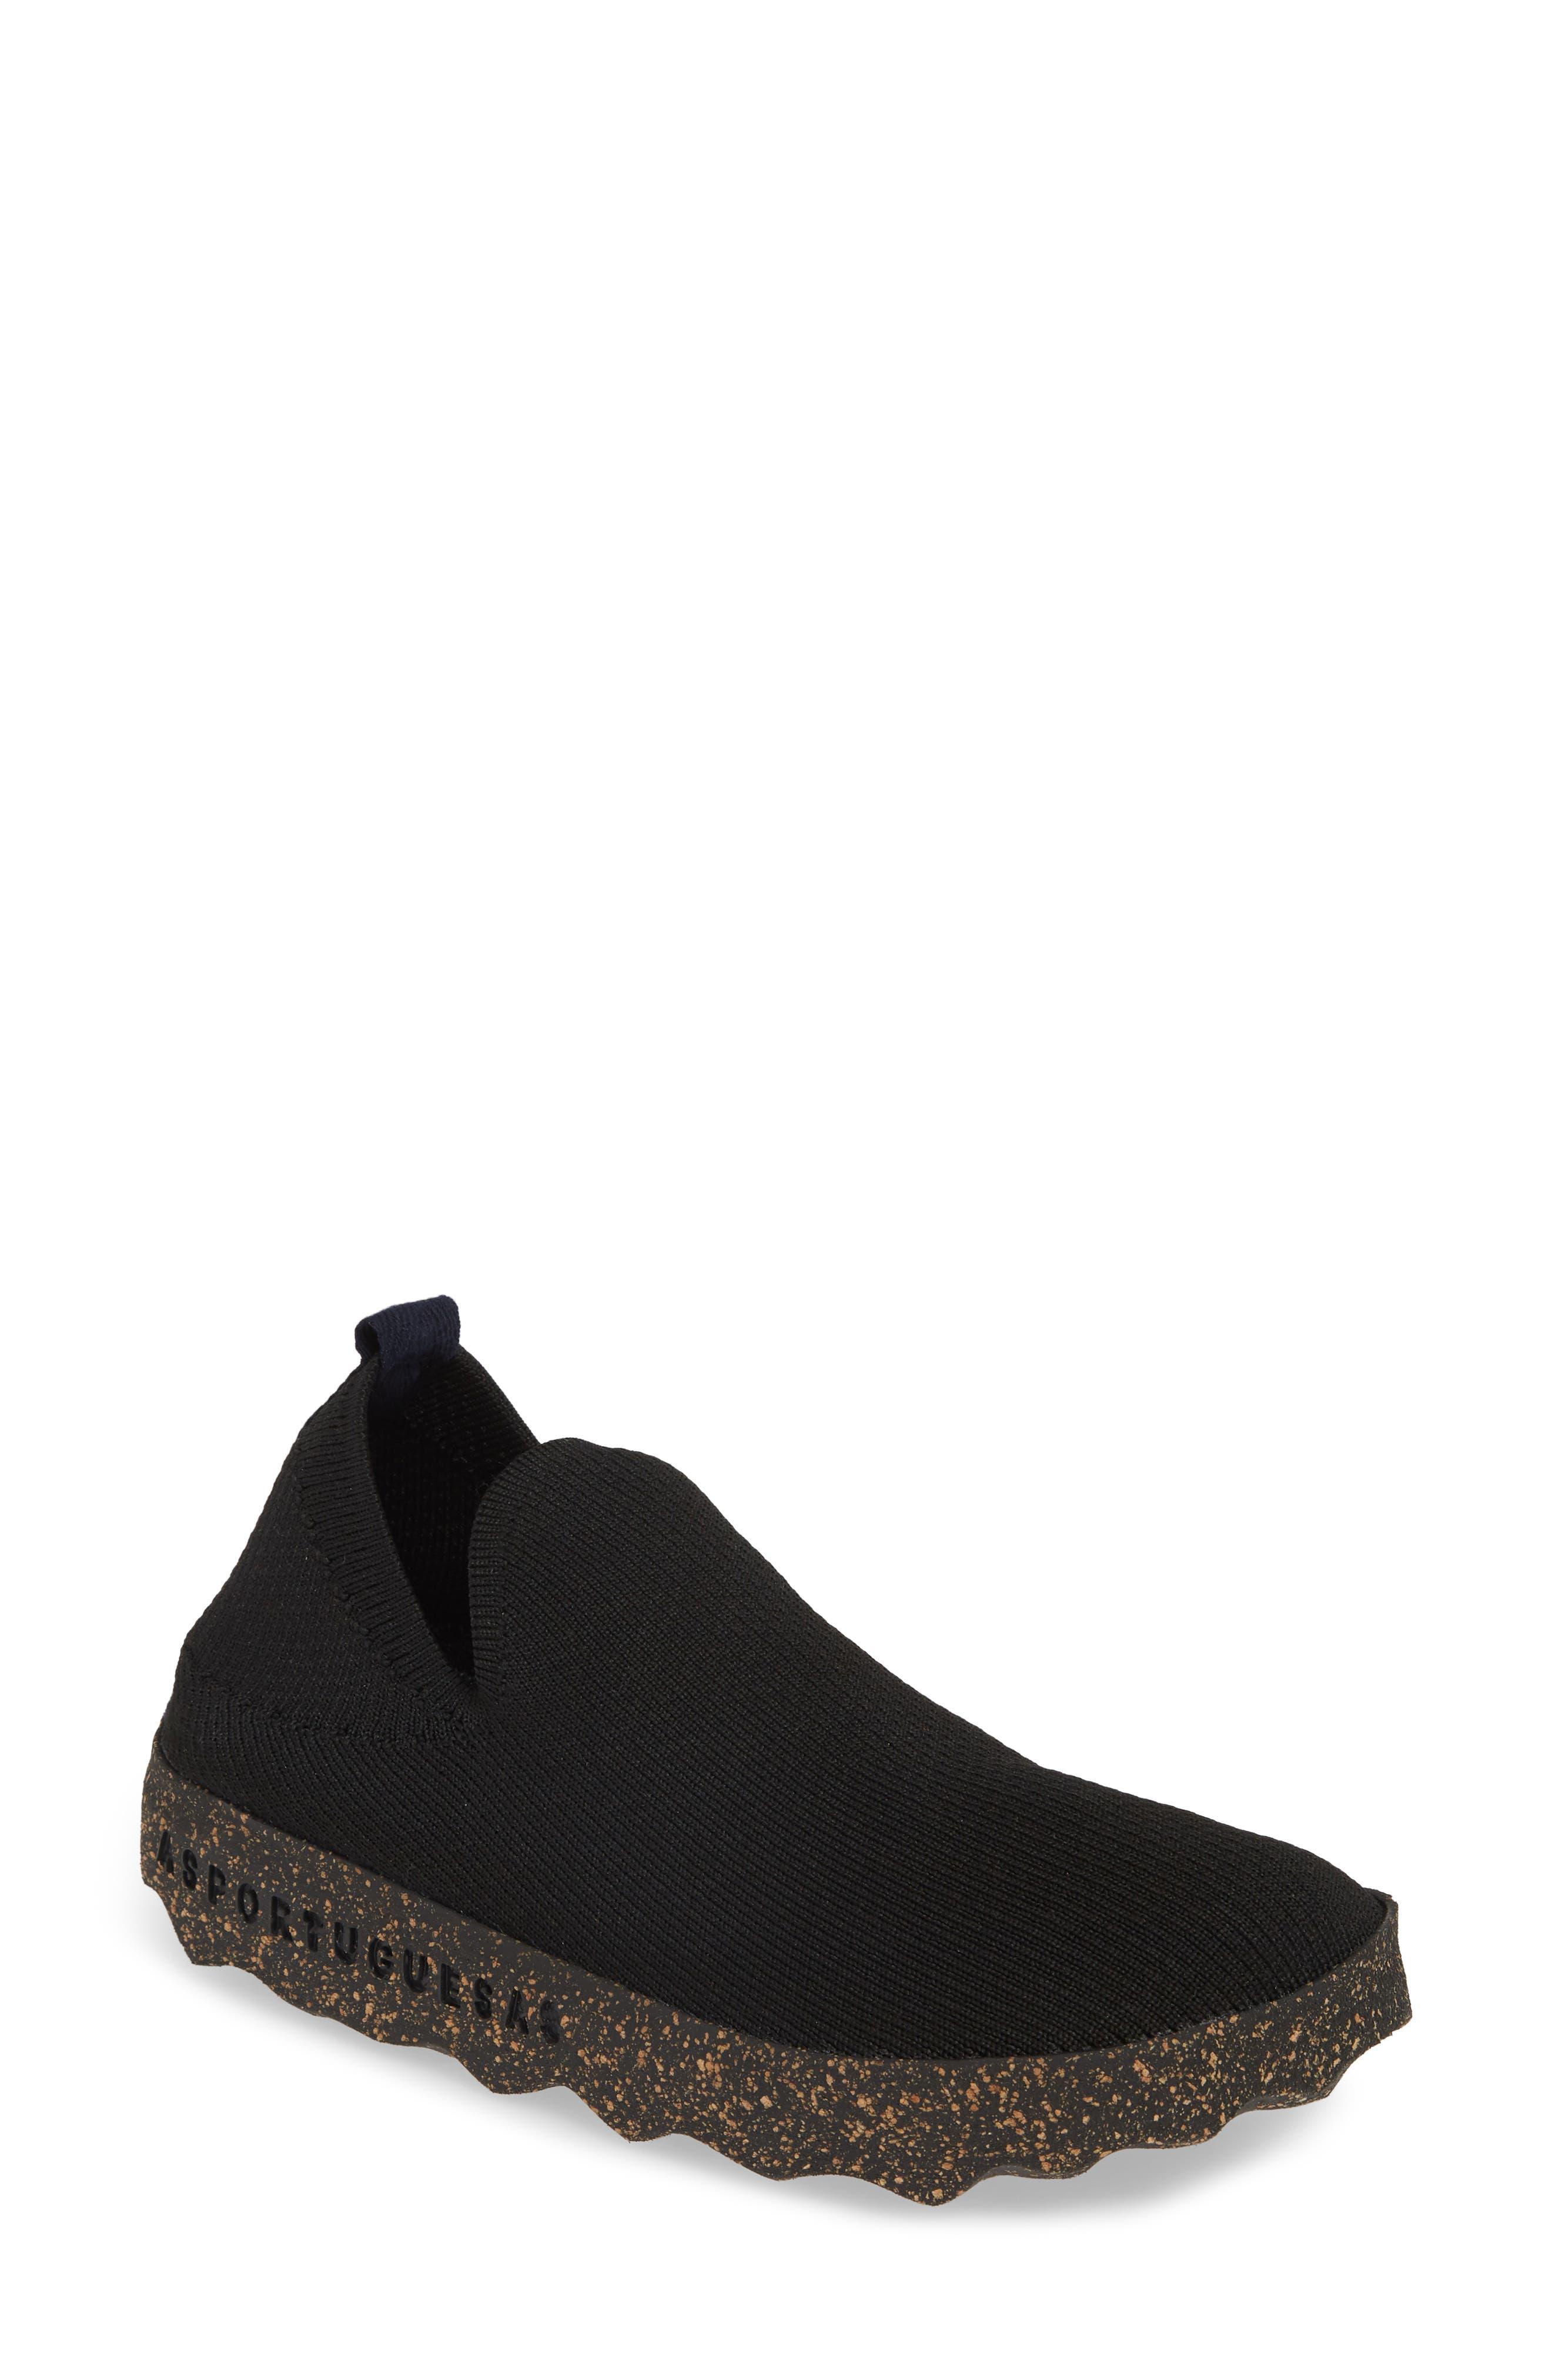 Asportuguesas By Fly London Care Sneaker, Black